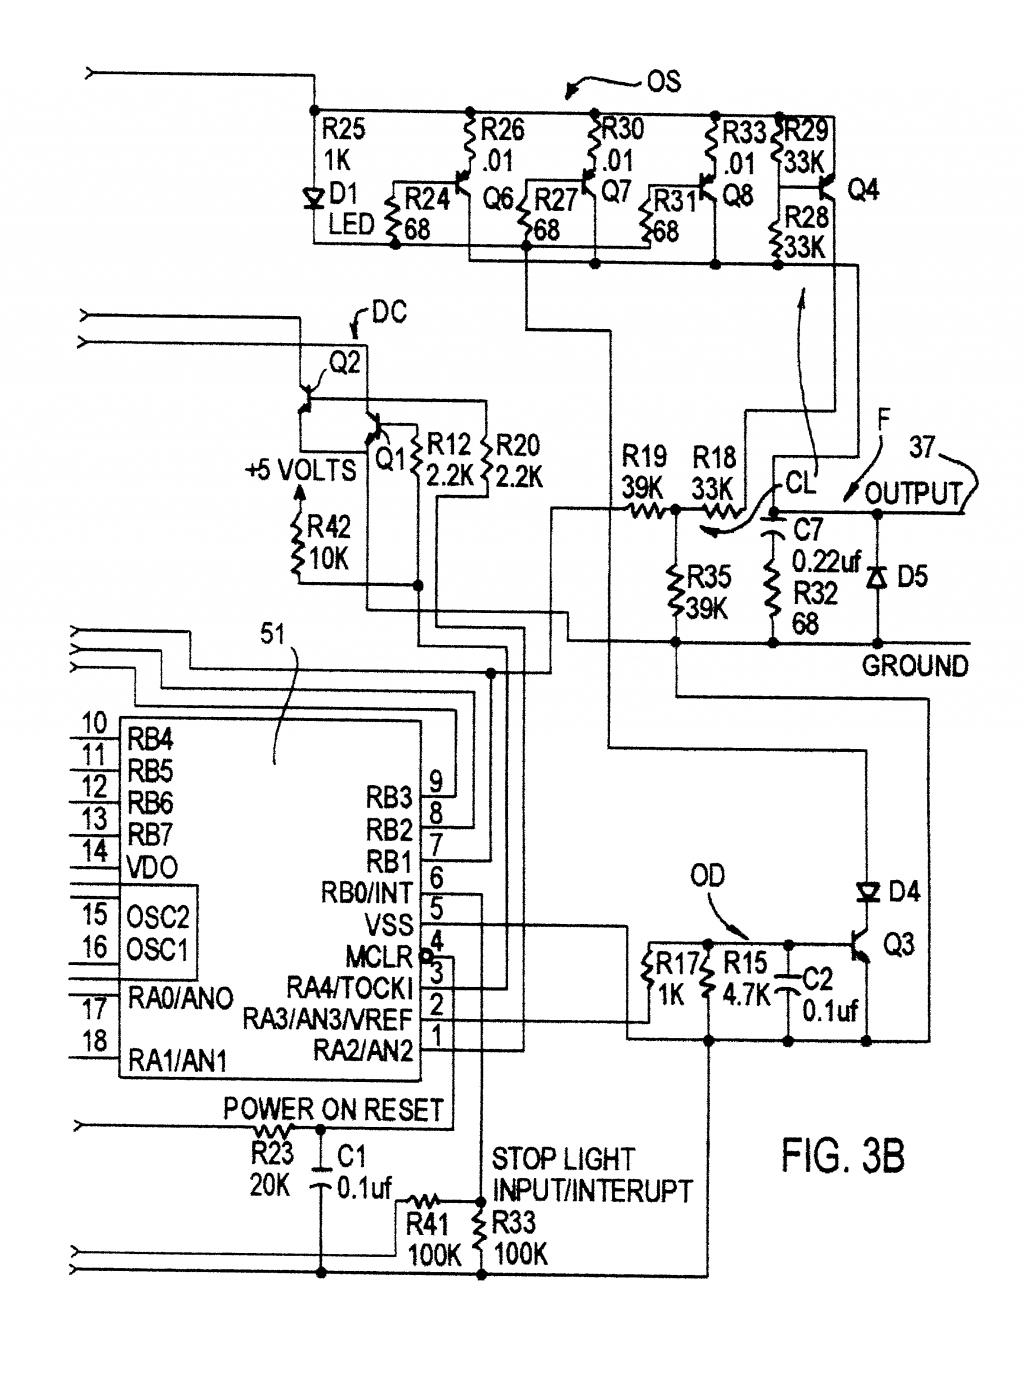 Primus Wiring Diagram Wiring Diagram Blogs Aircraft Wiring Diagrams Primus Wiring Diagram